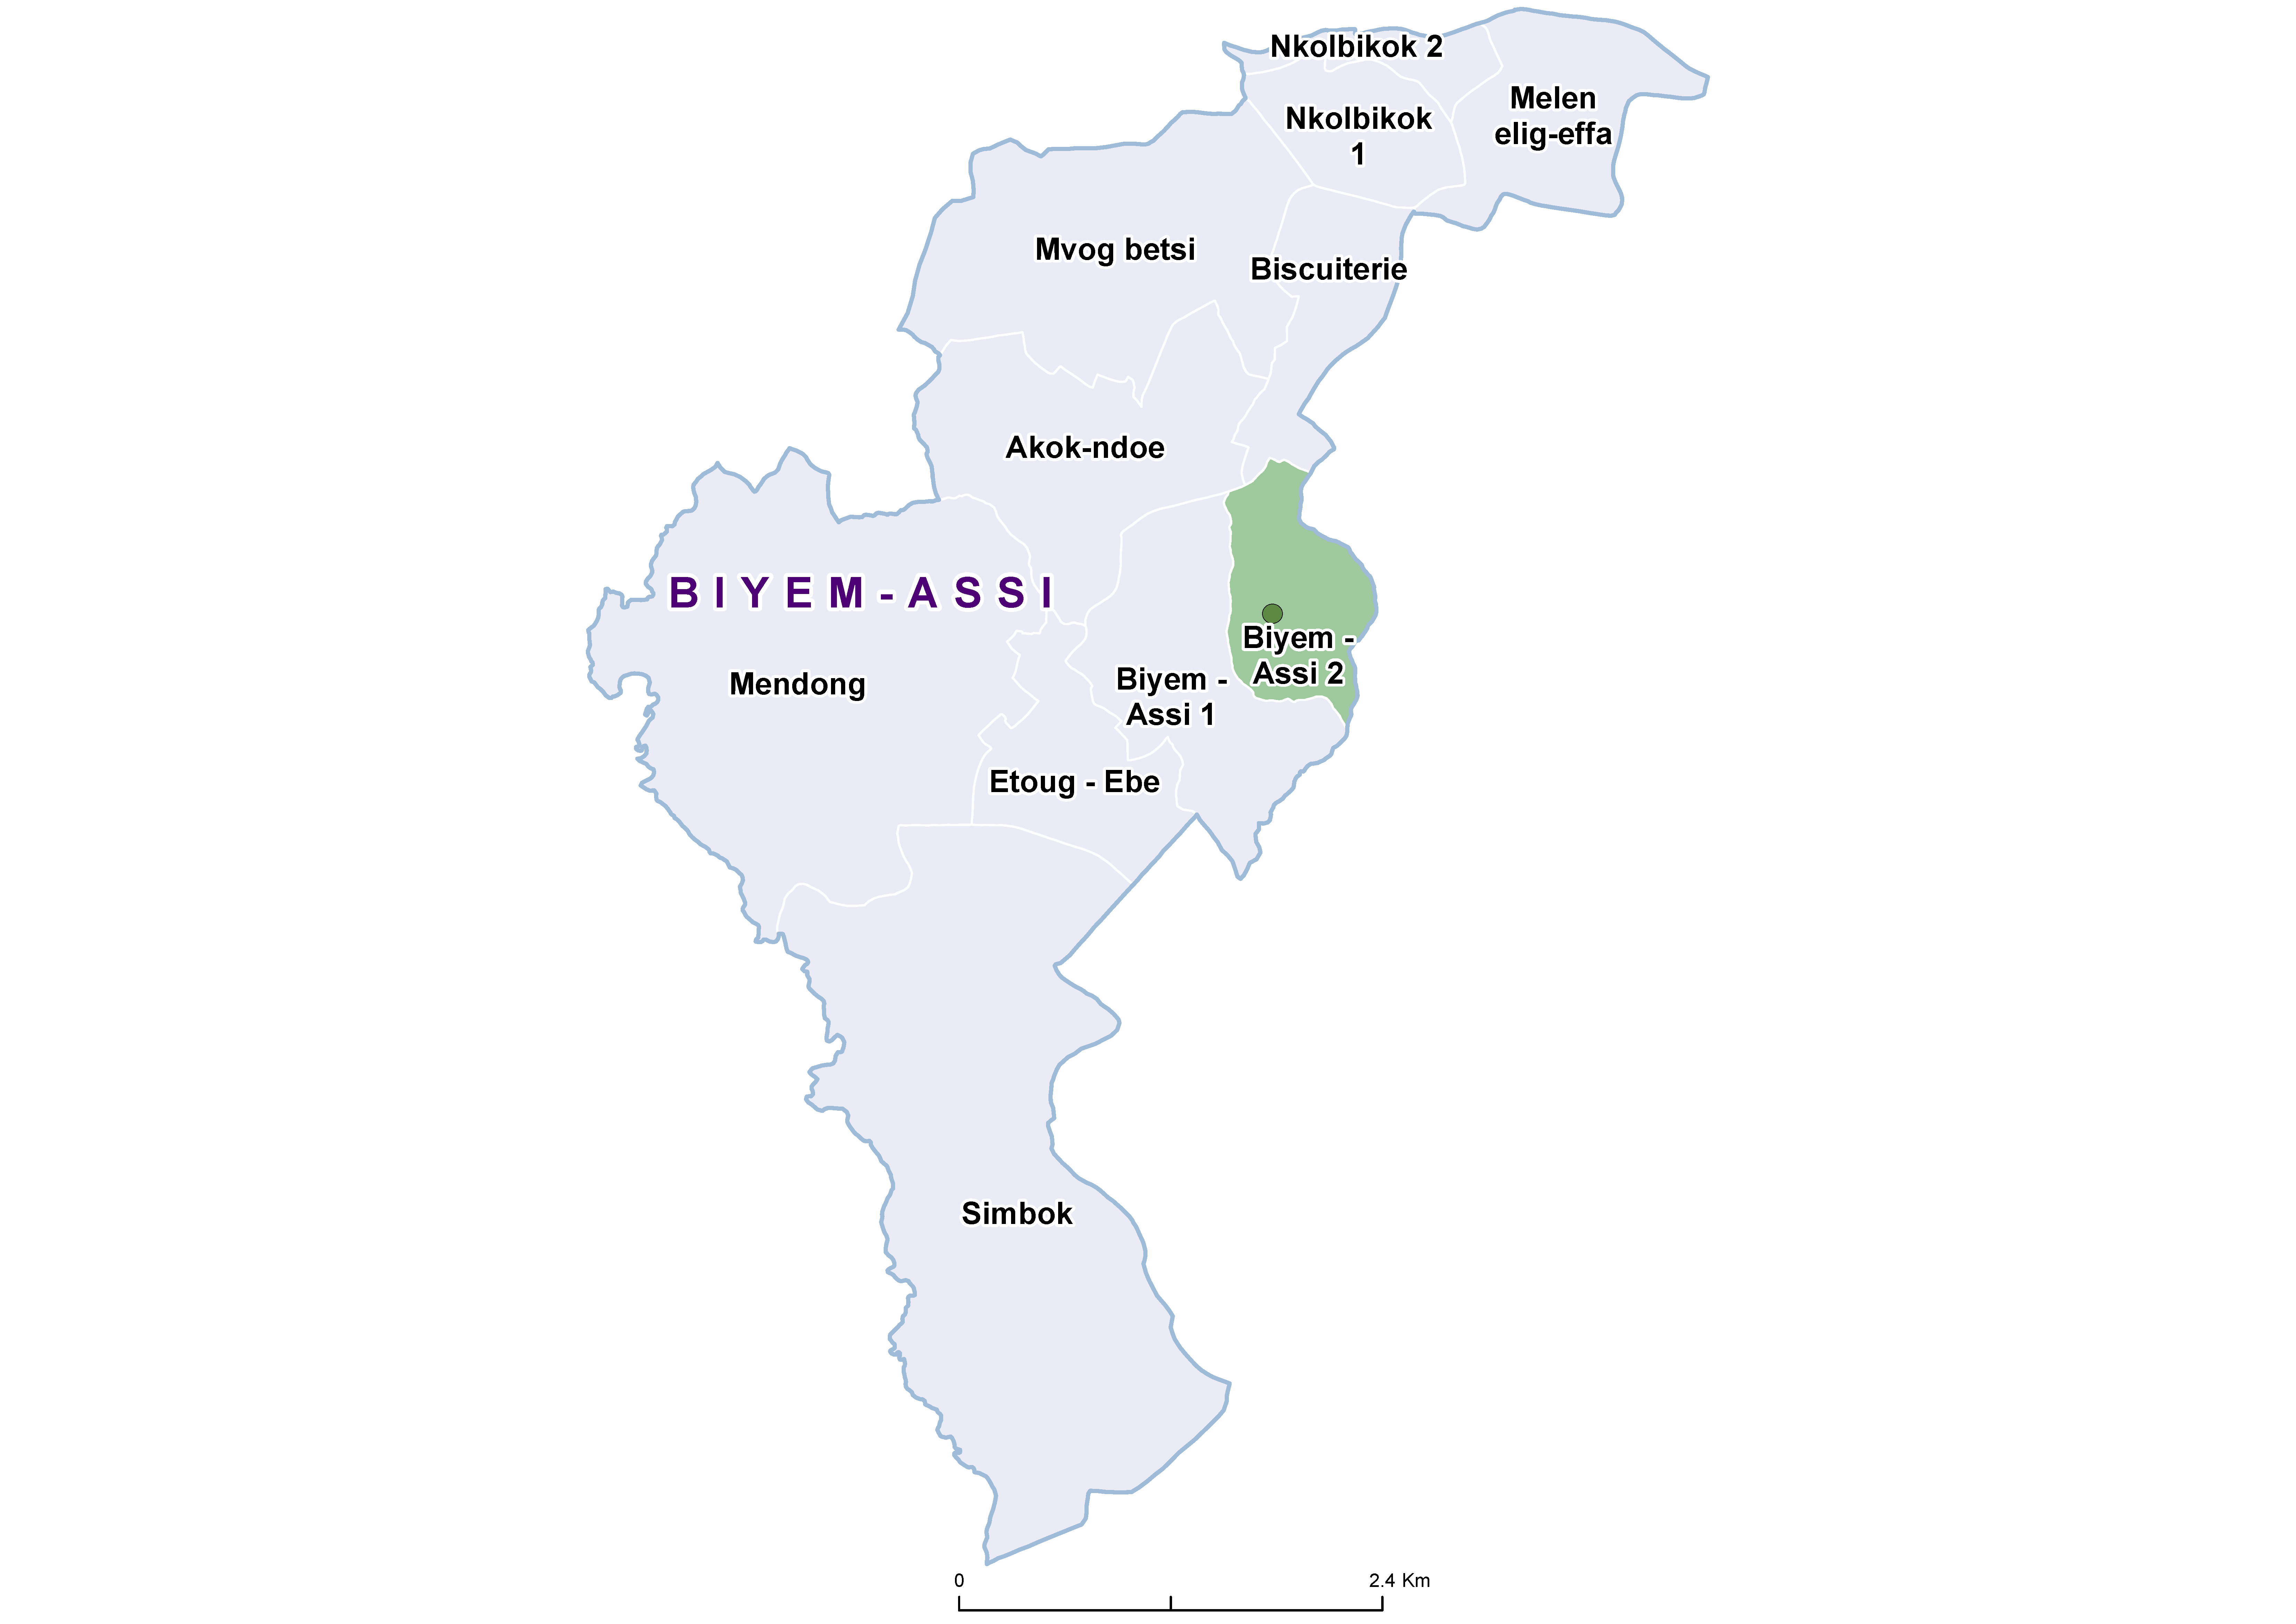 Biyem-assi SCH 20180001